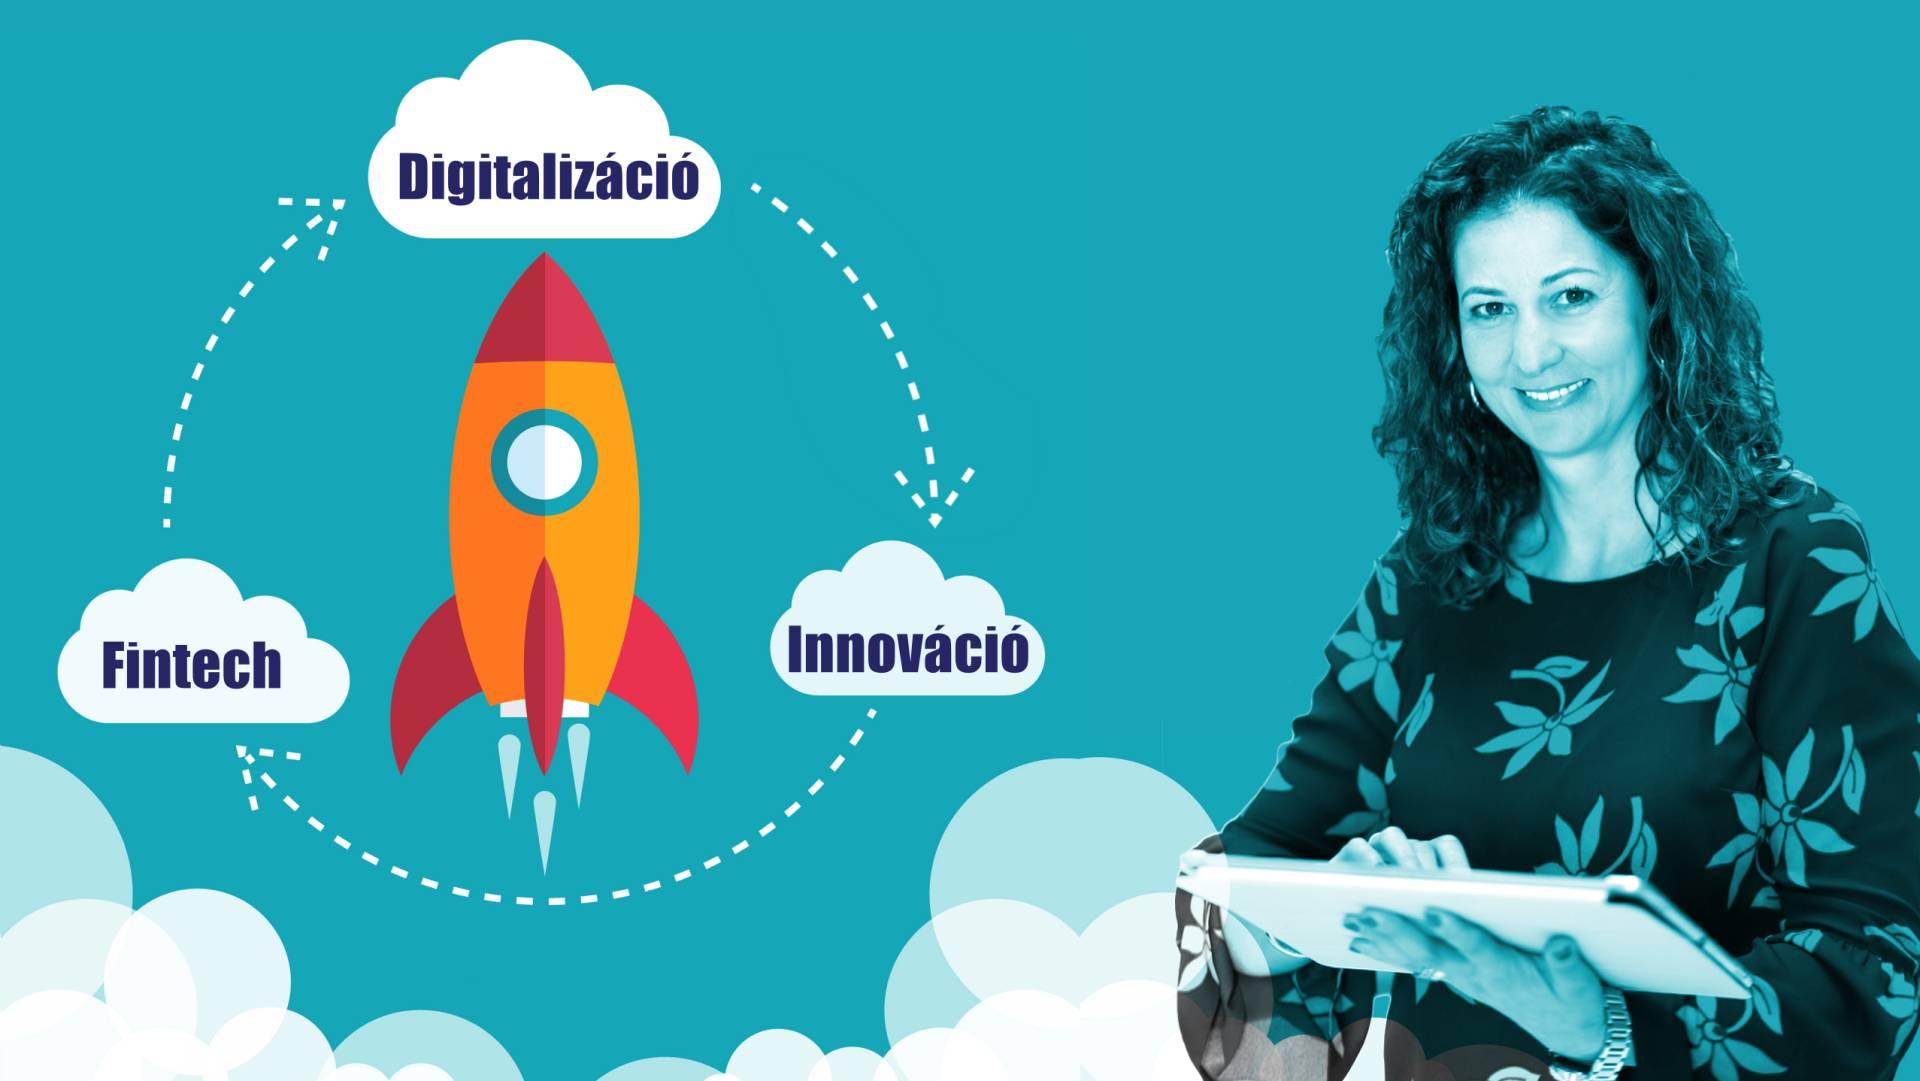 Fundamenta Digiverzum Digimaraton innováció fintech digitalizáció